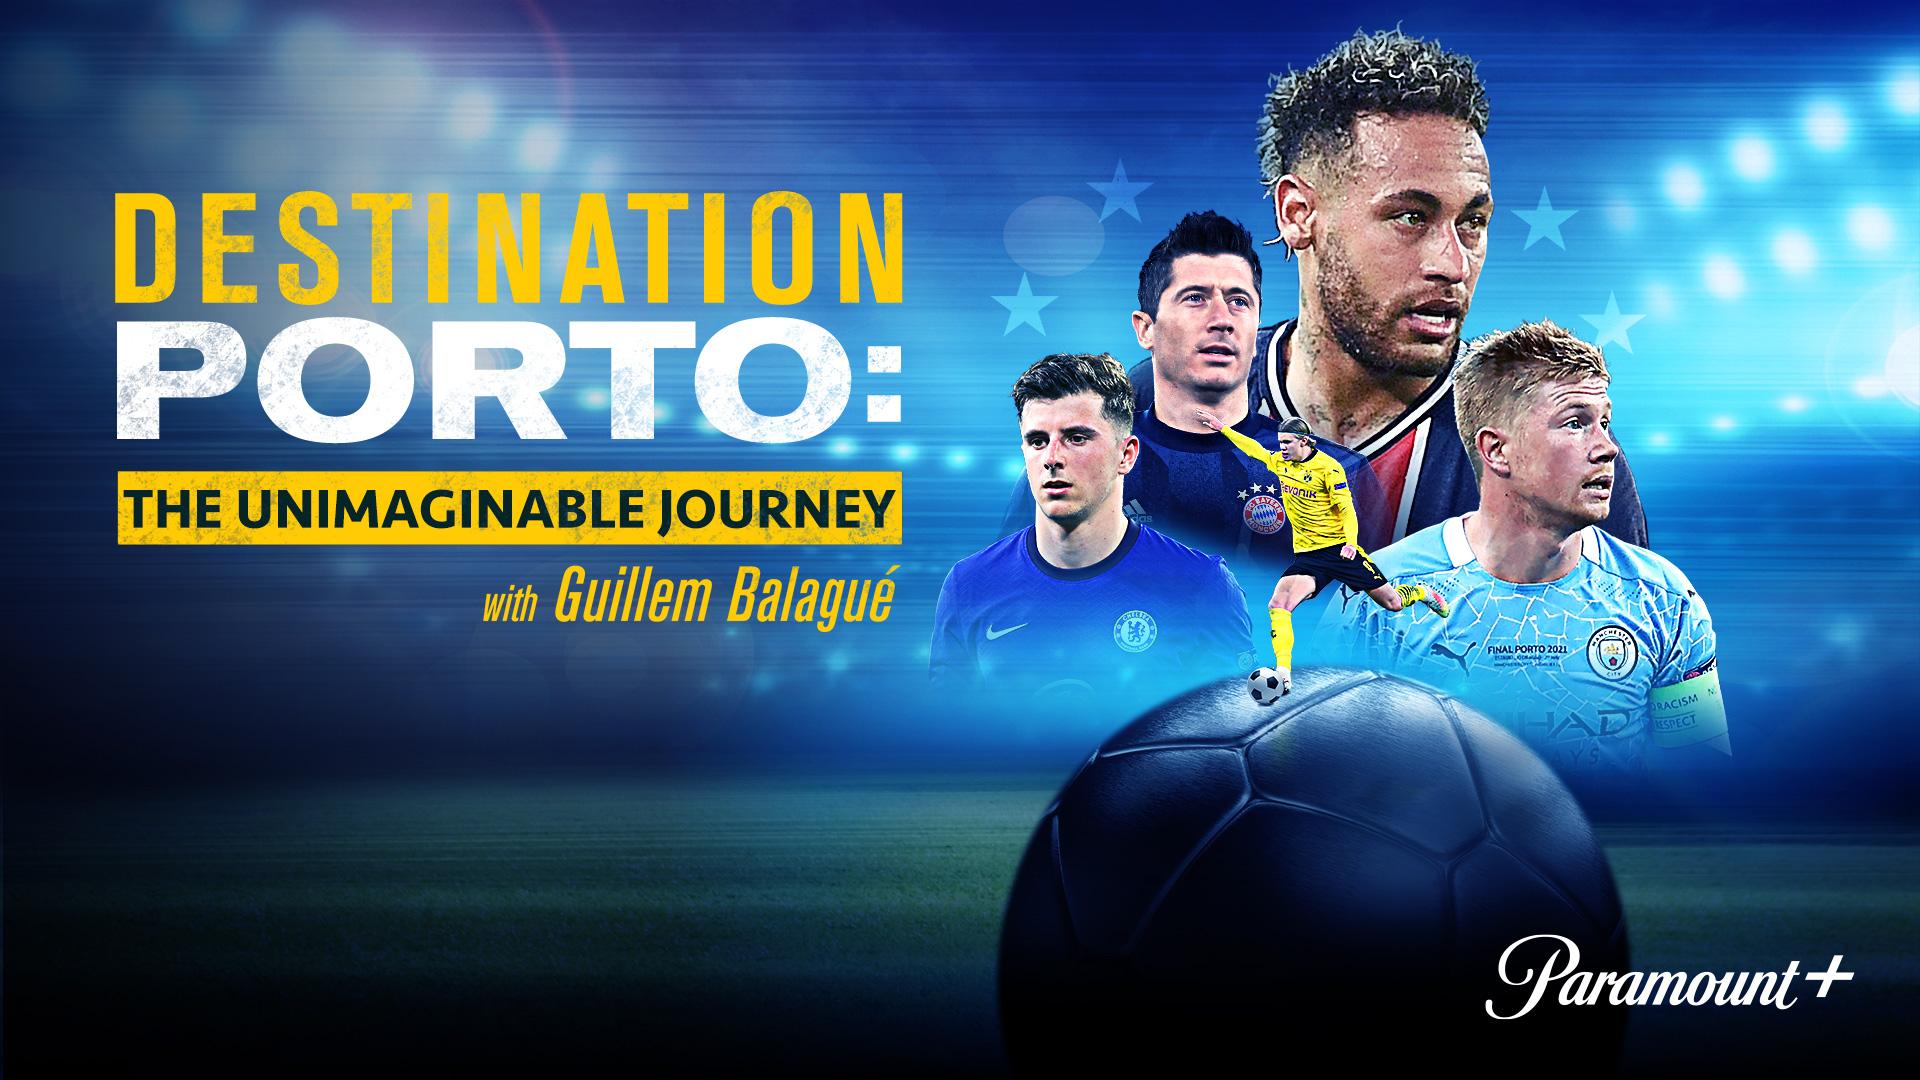 Destination Porto: The Unimaginable Journey